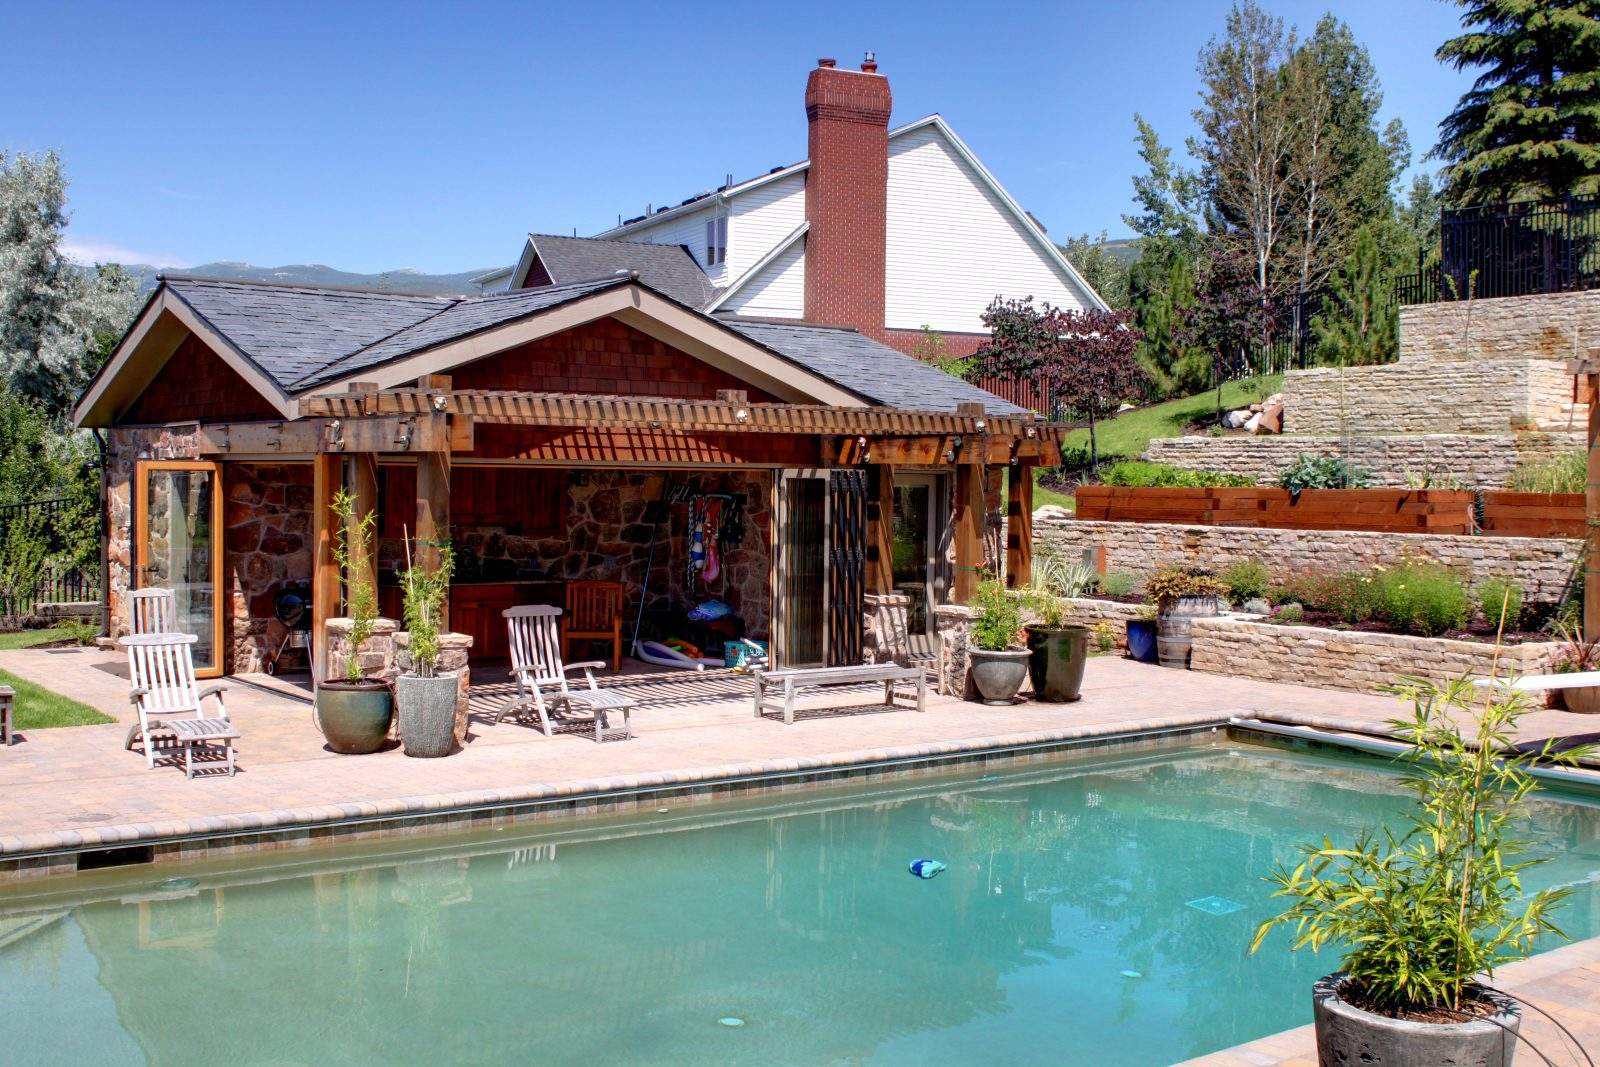 After_Exterior-Renovation_Backyard_Pool-House-Remodel | Renovation Design Group